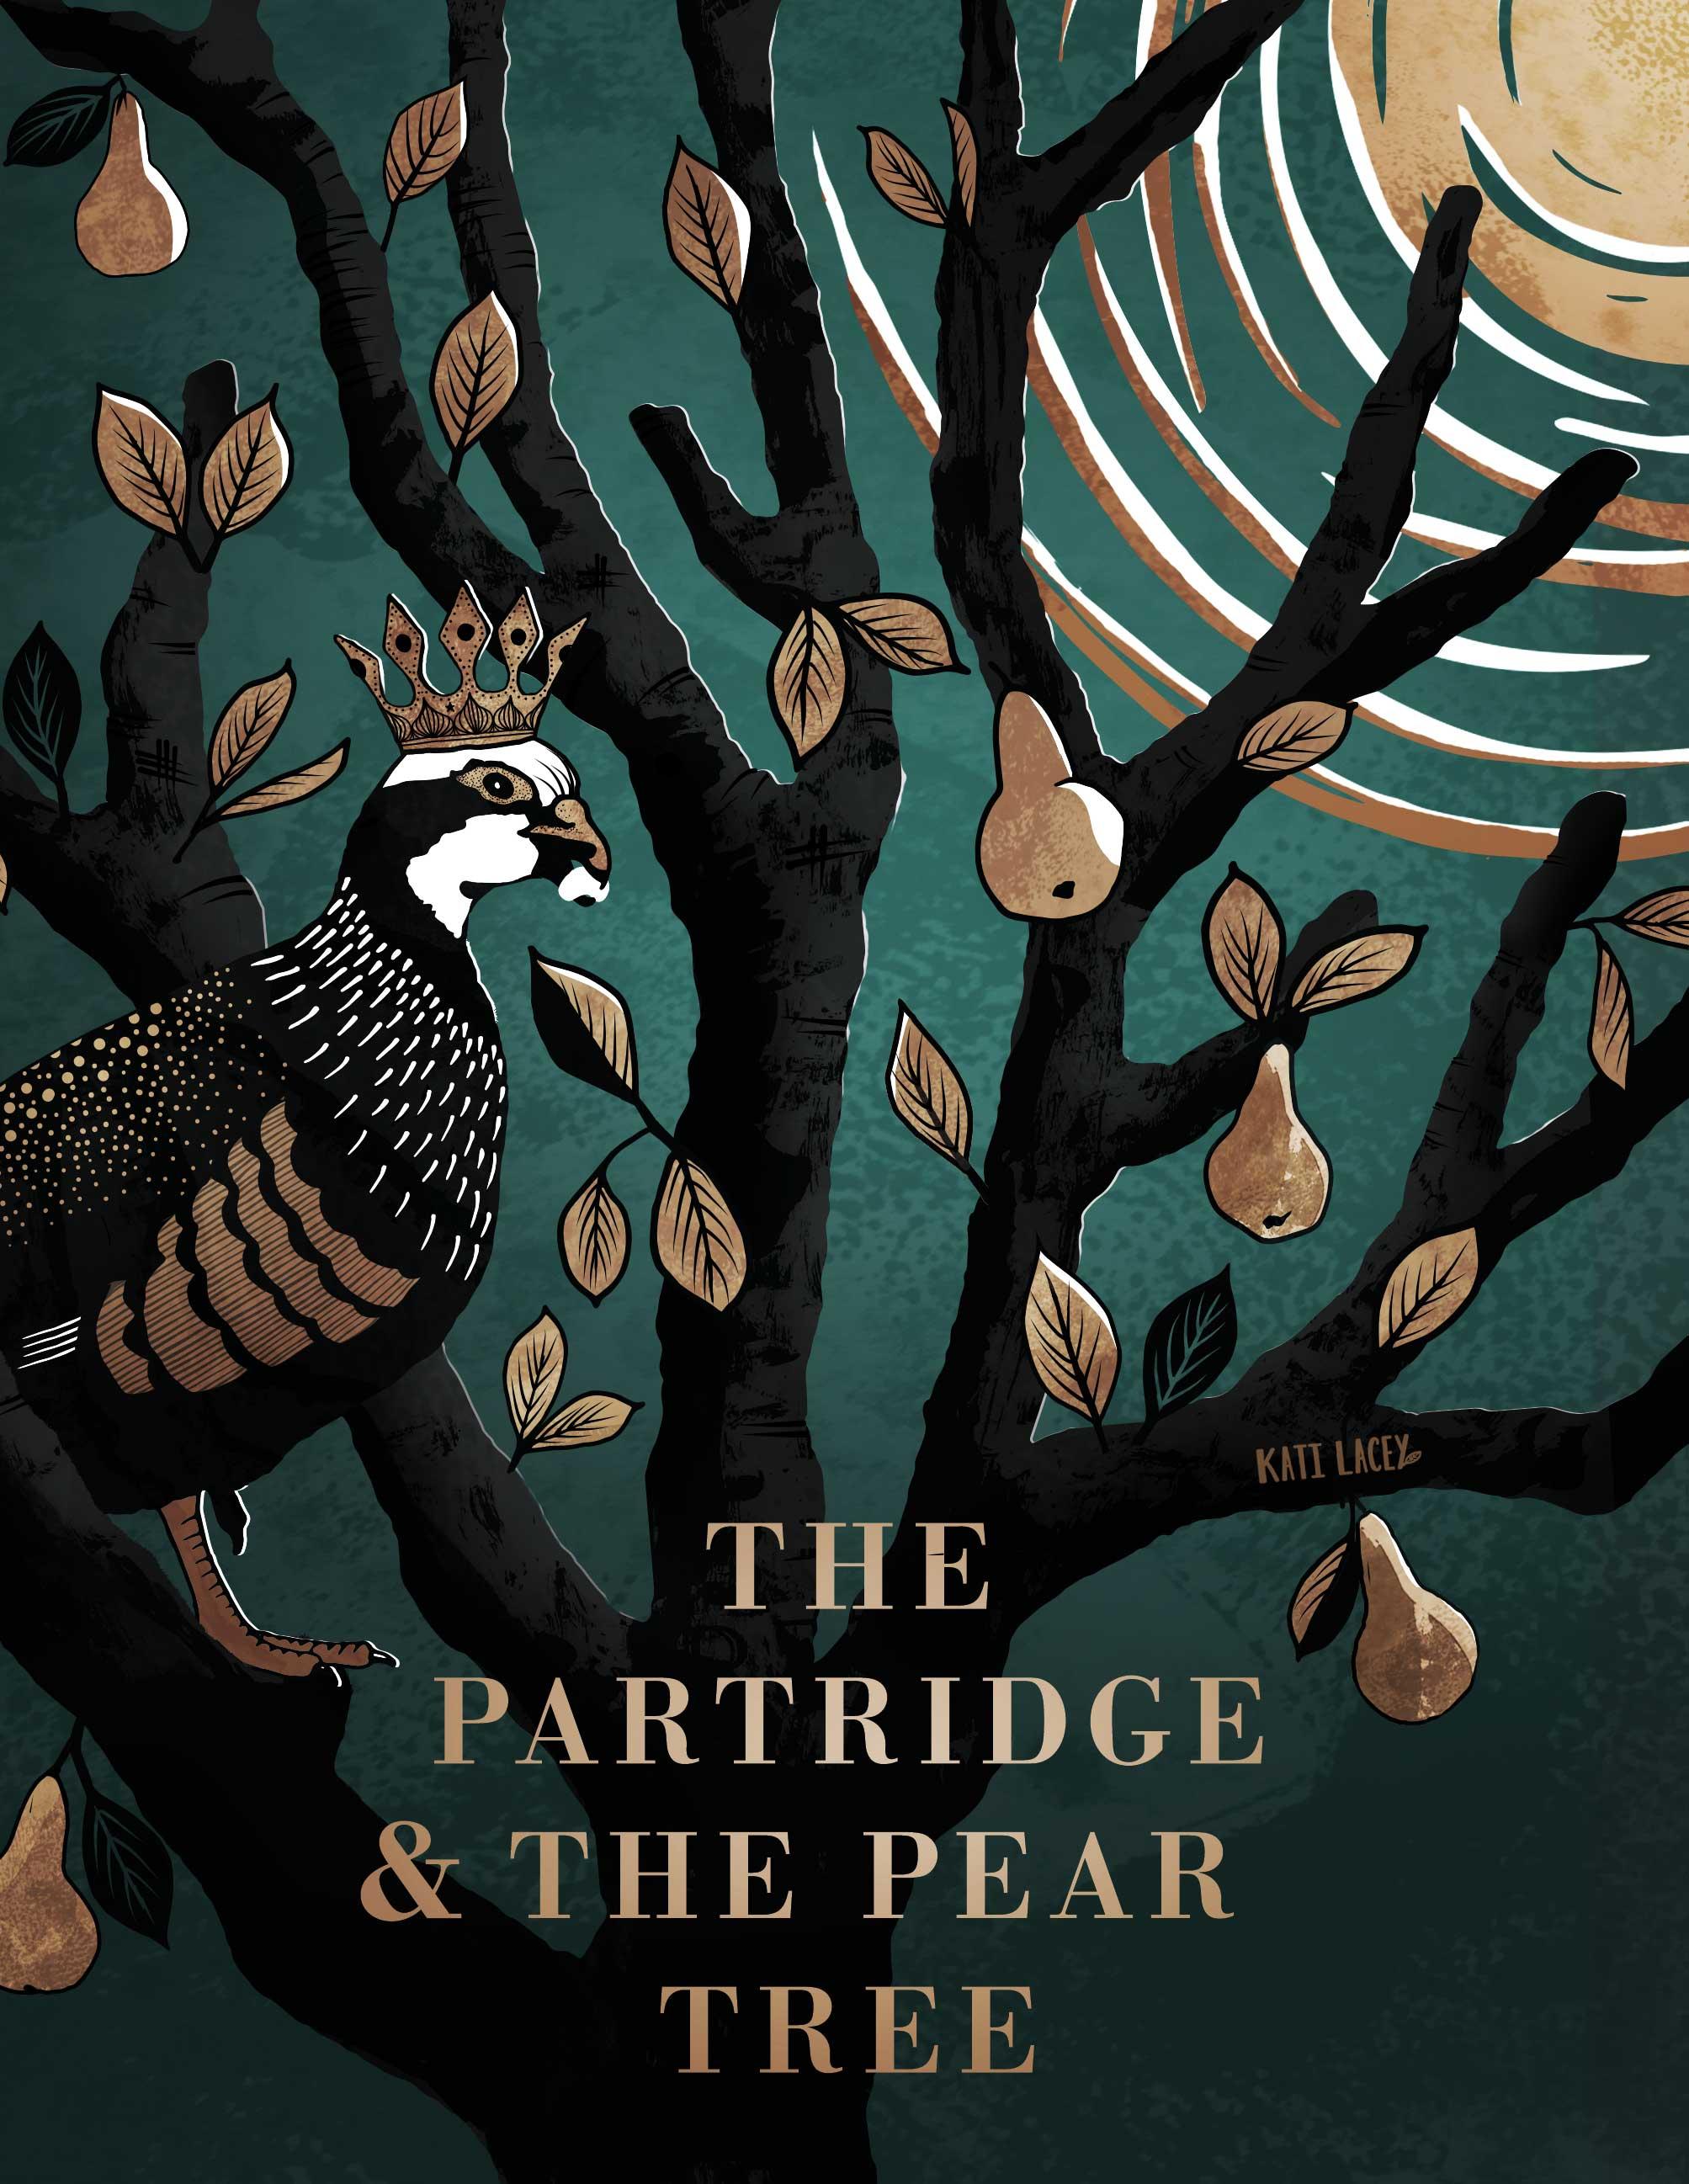 partridge-in-pear-tree-telve-days-of-christmas-true-love-twelfth-night-games-parlour-cake-bean